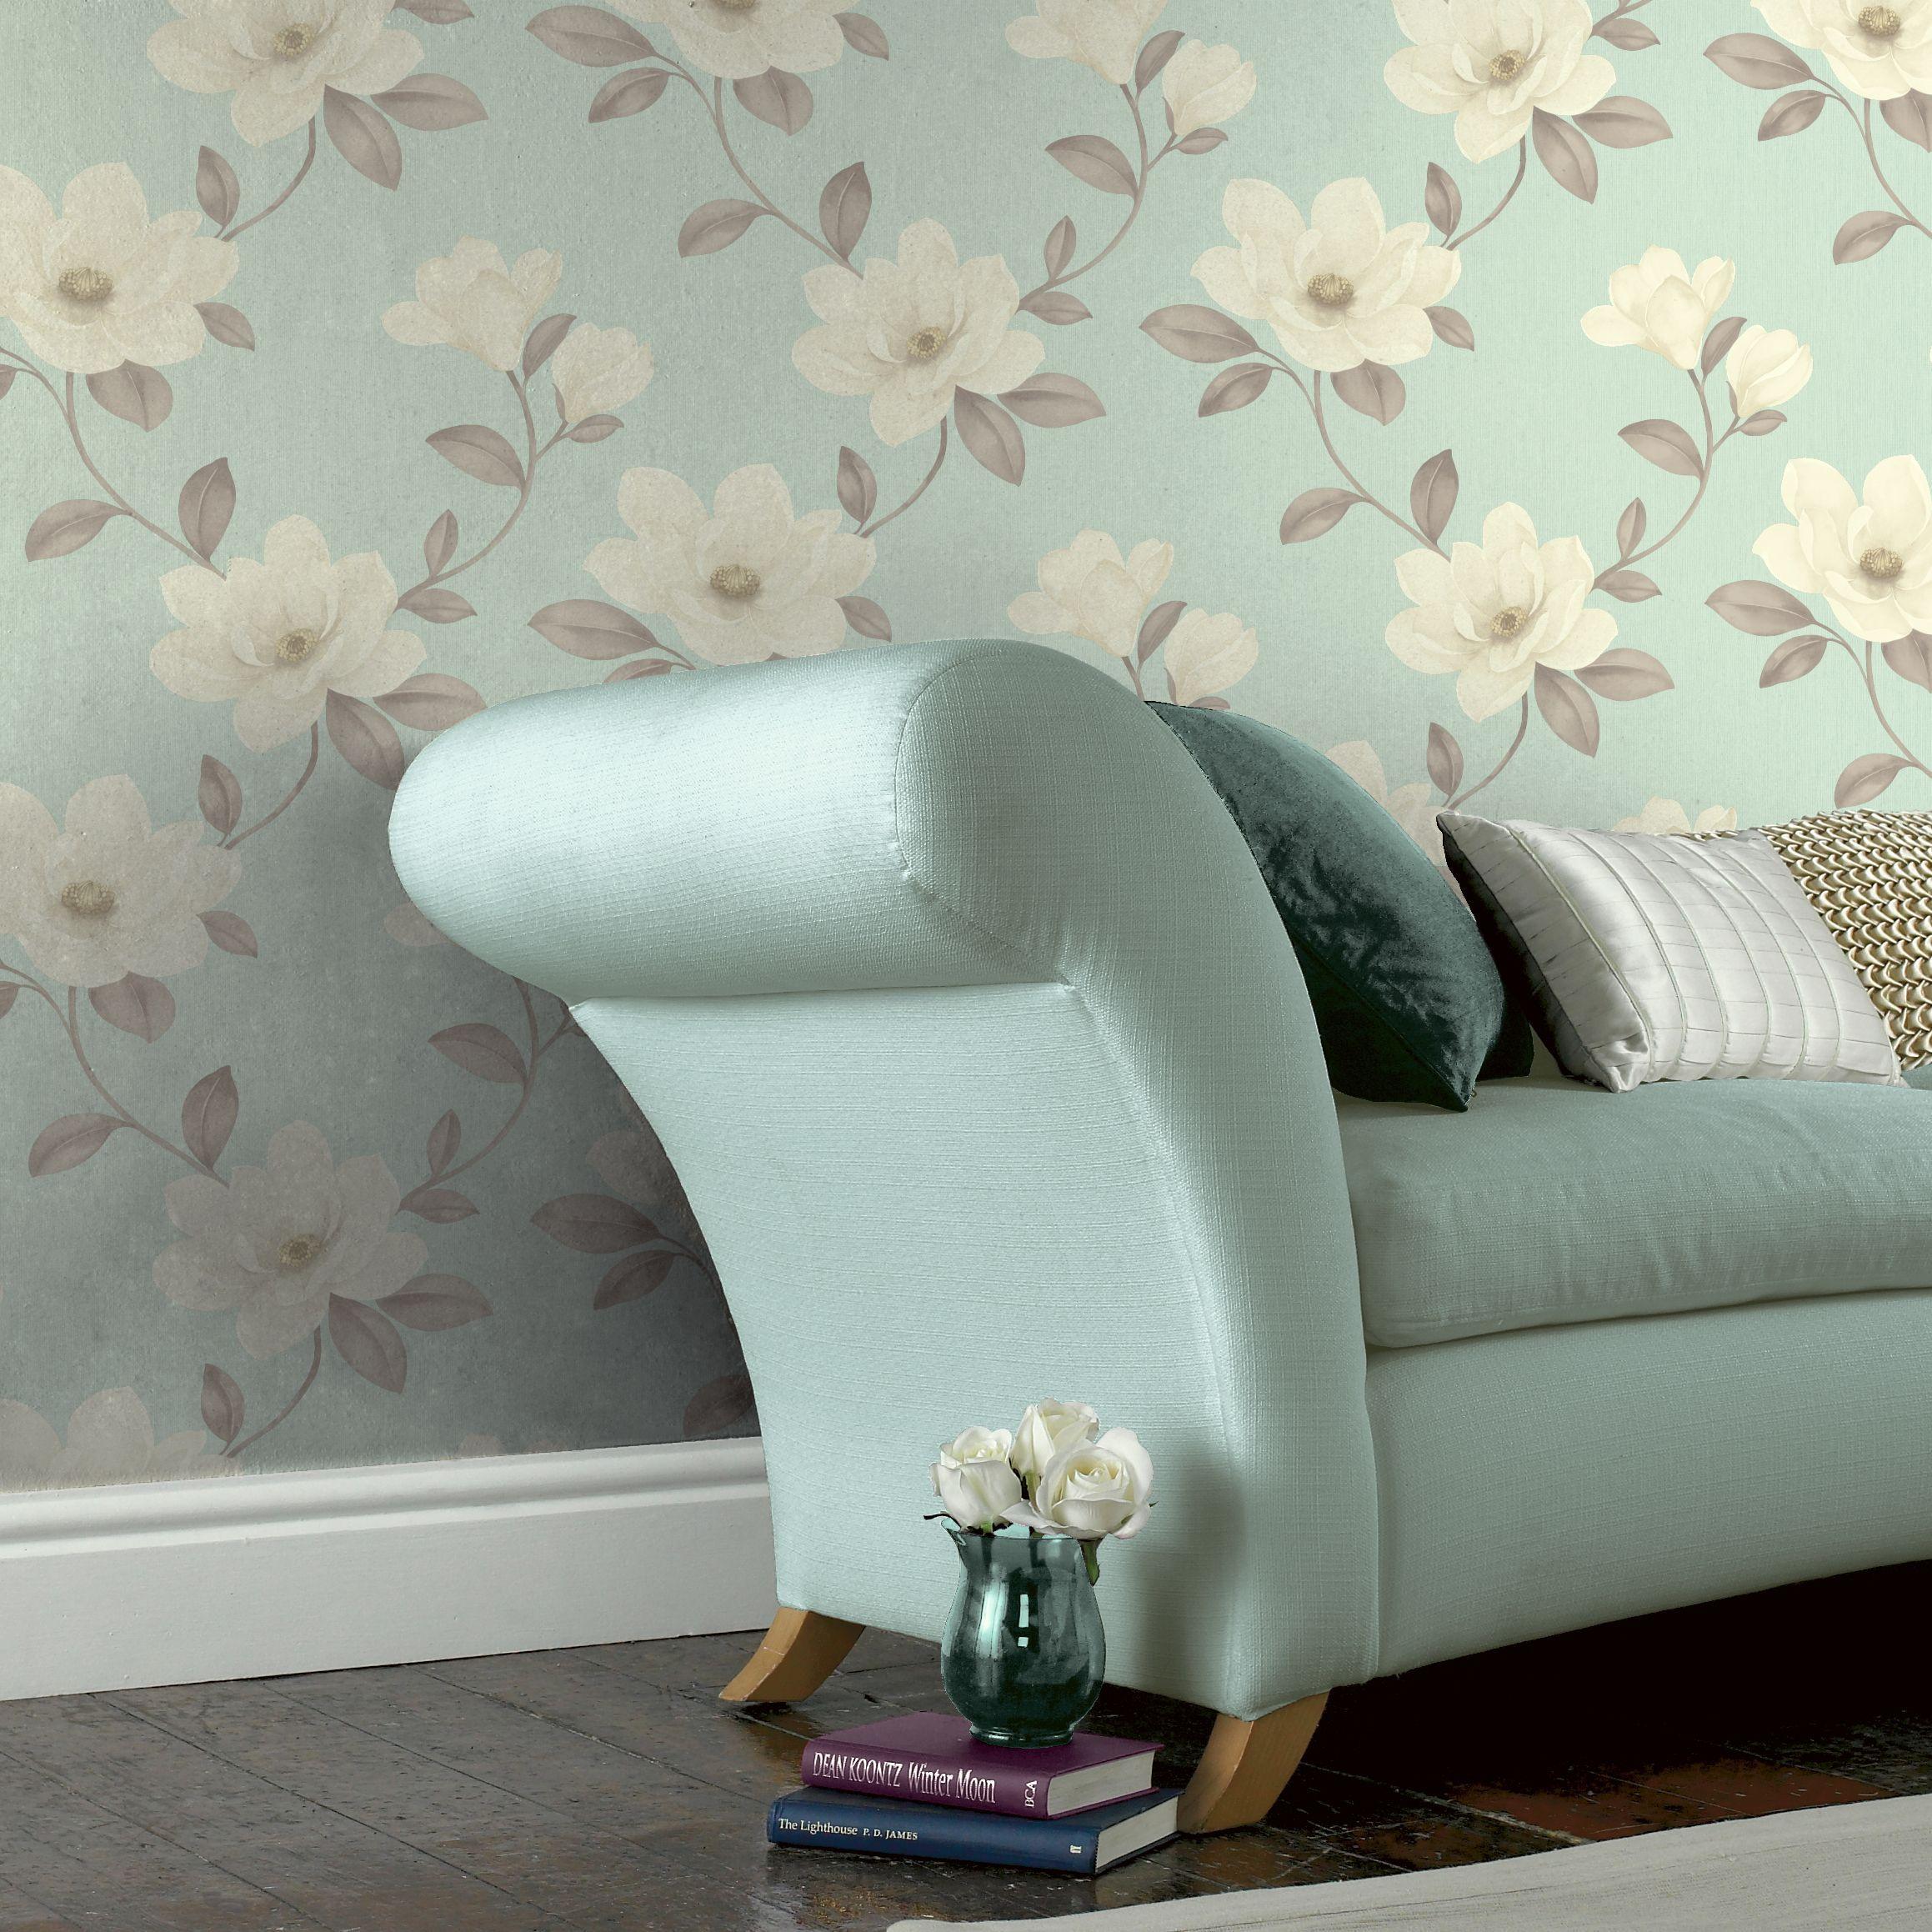 Sophie Conran Magnolia Blue Cream Floral Wallpaper